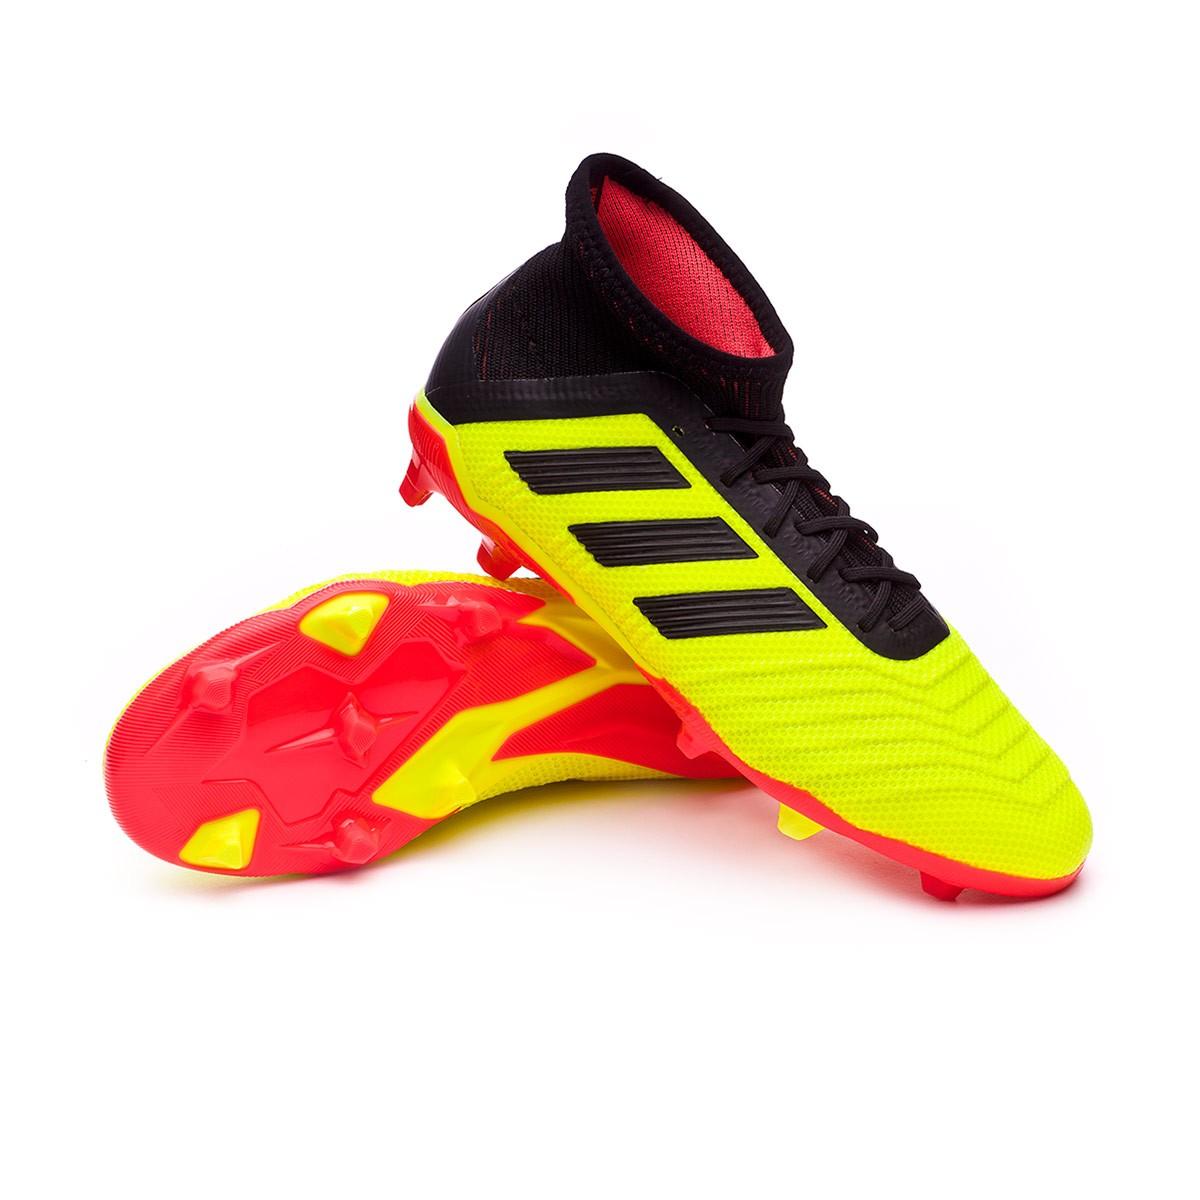 24d018318 Football Boots adidas Kids Predator 18.1 FG Solar yellow-Black-Solar ...